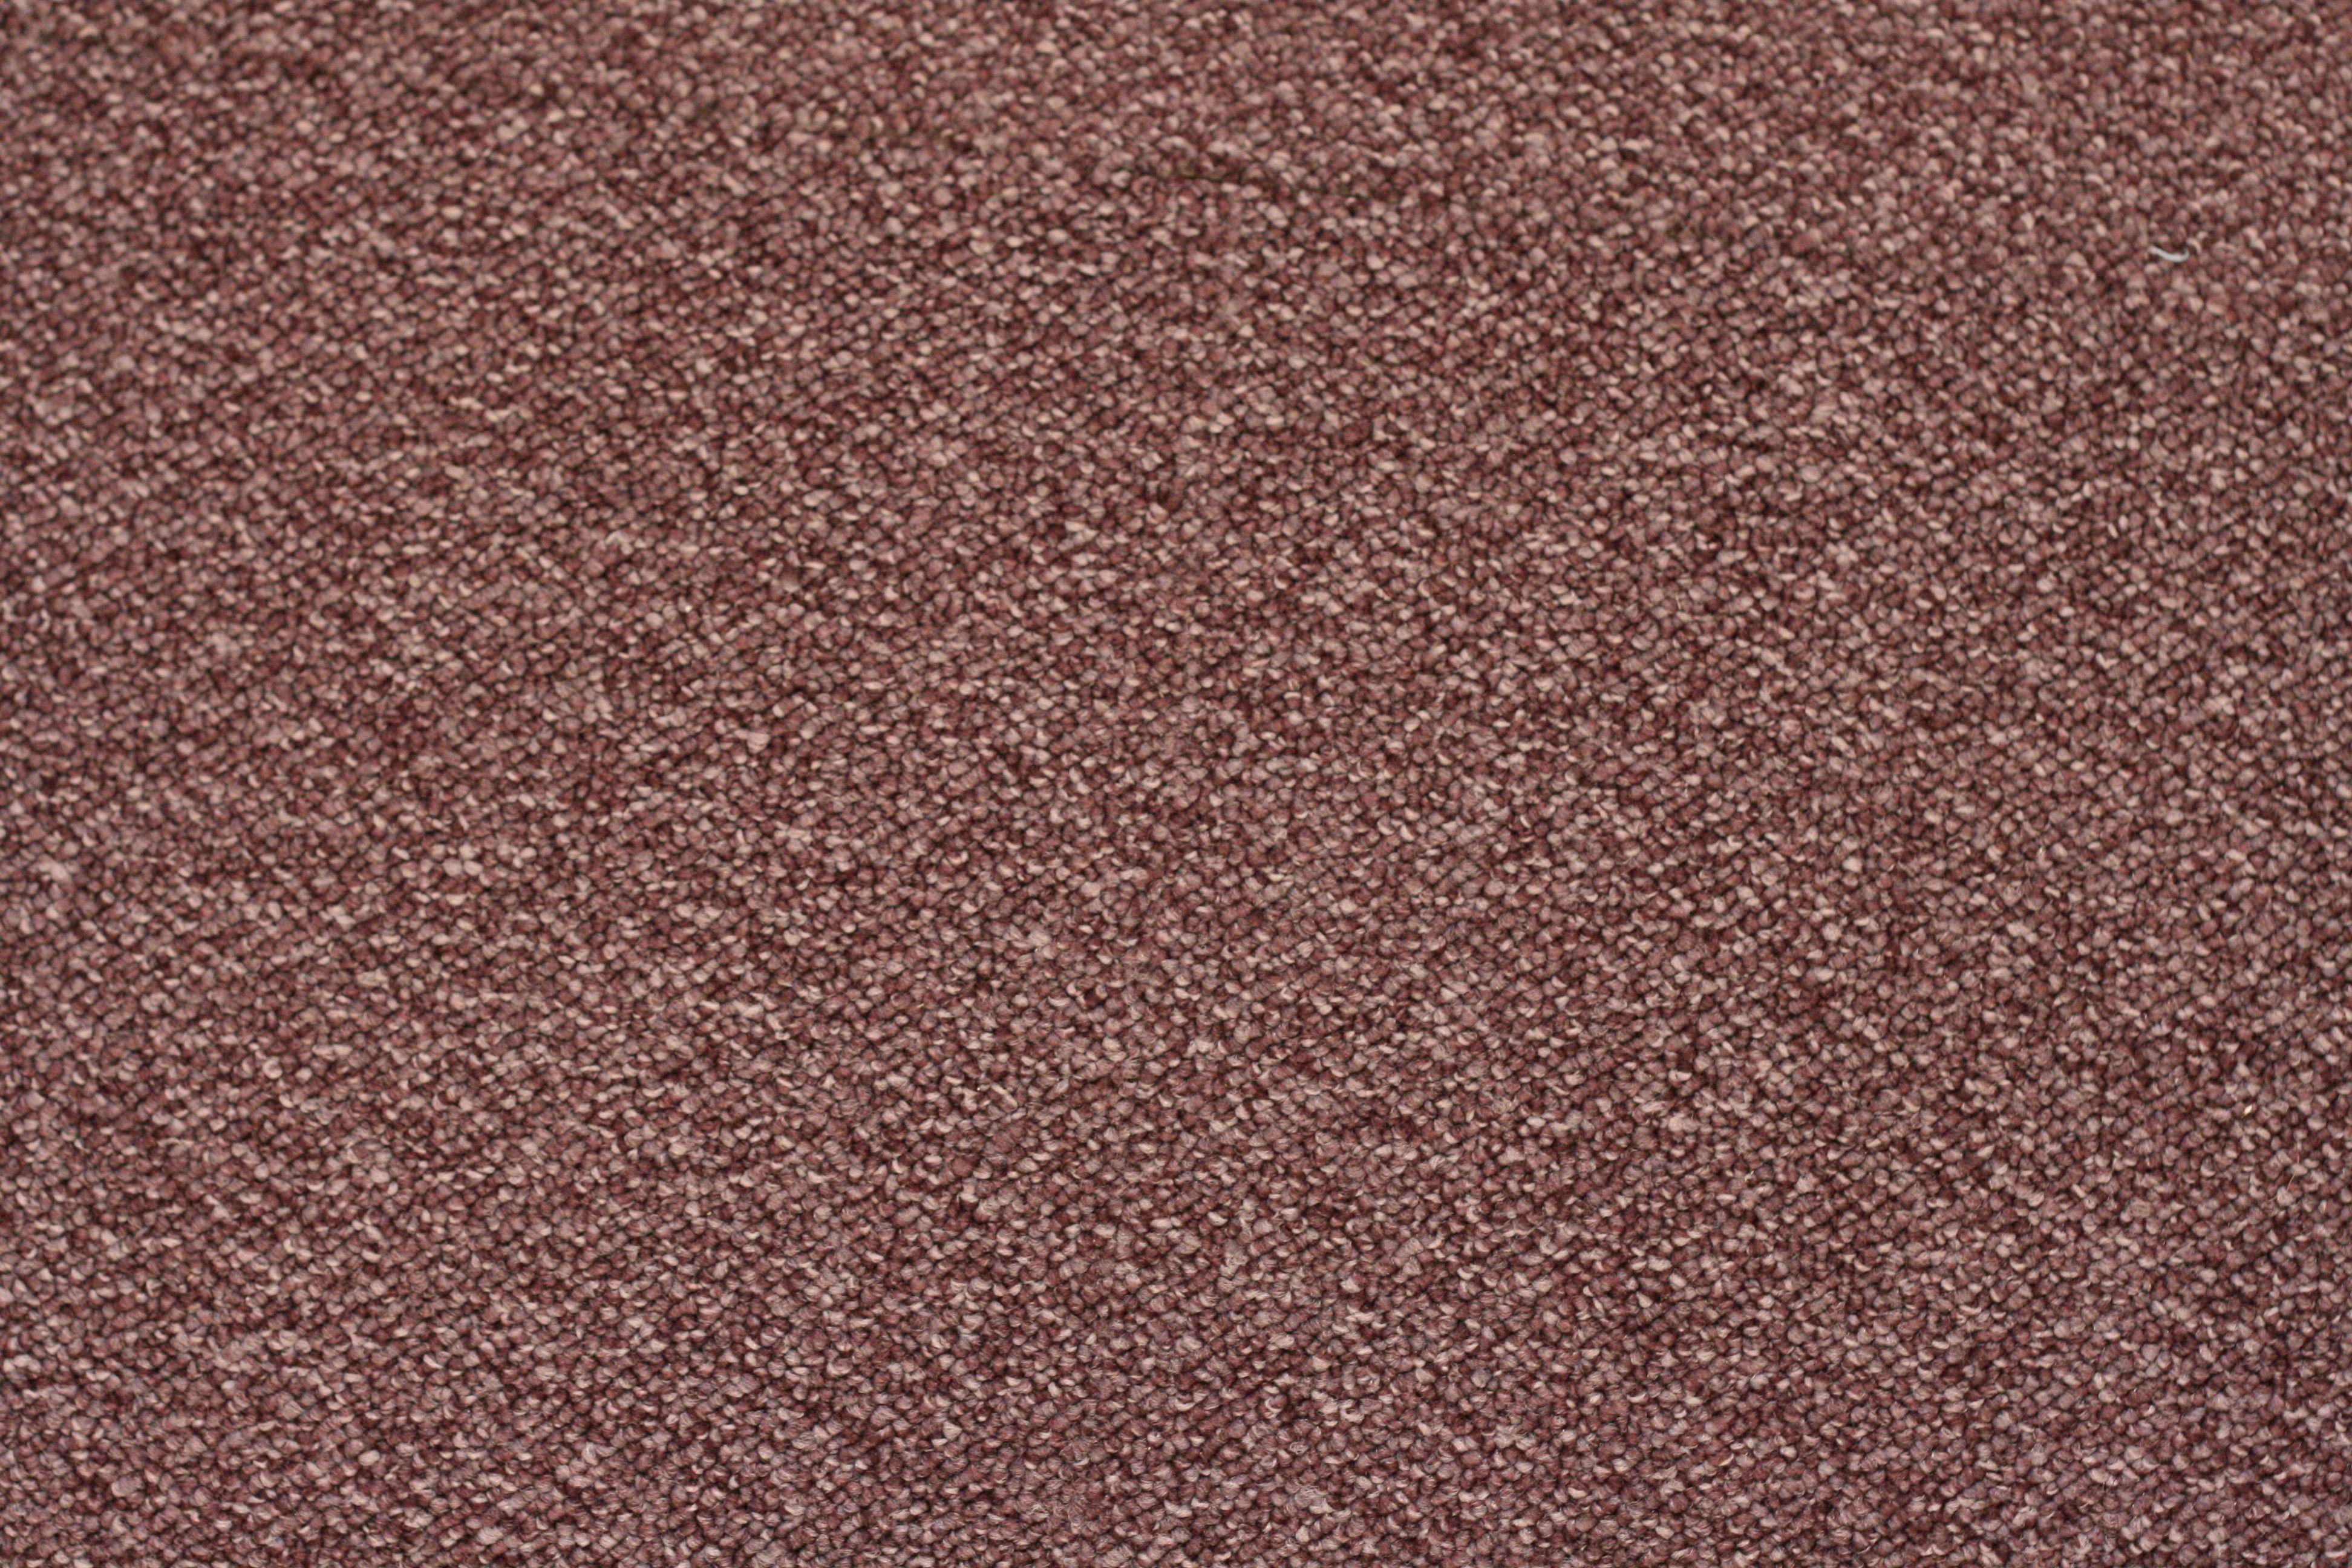 Carpet - Google Search | Carpet in 2018 | Pinterest ...